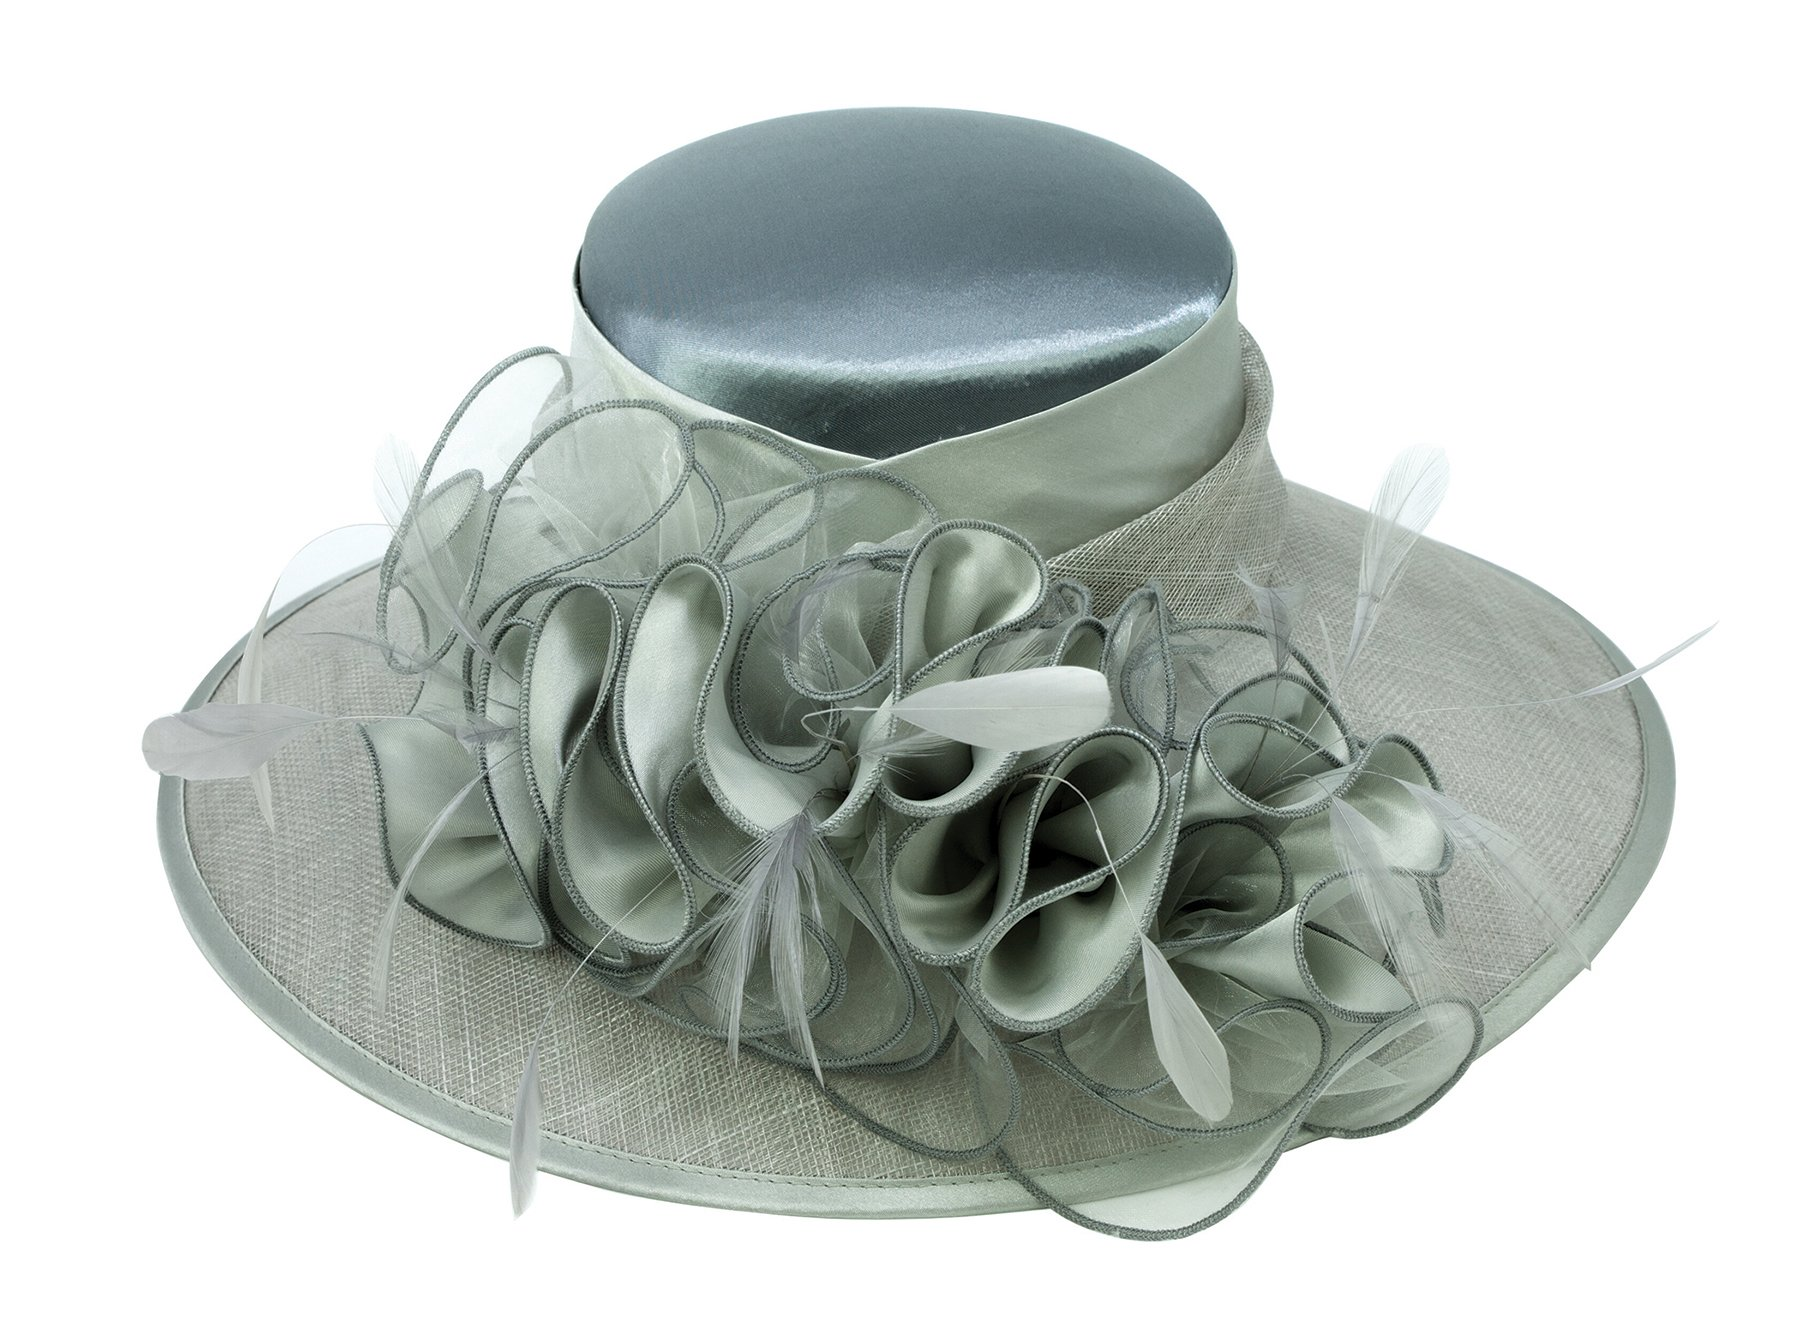 ChicHeadwear Womens Wide Brim Bow Sinamay Fashion Hat - Silver w/Charcoal by ChicHeadwear (Image #1)